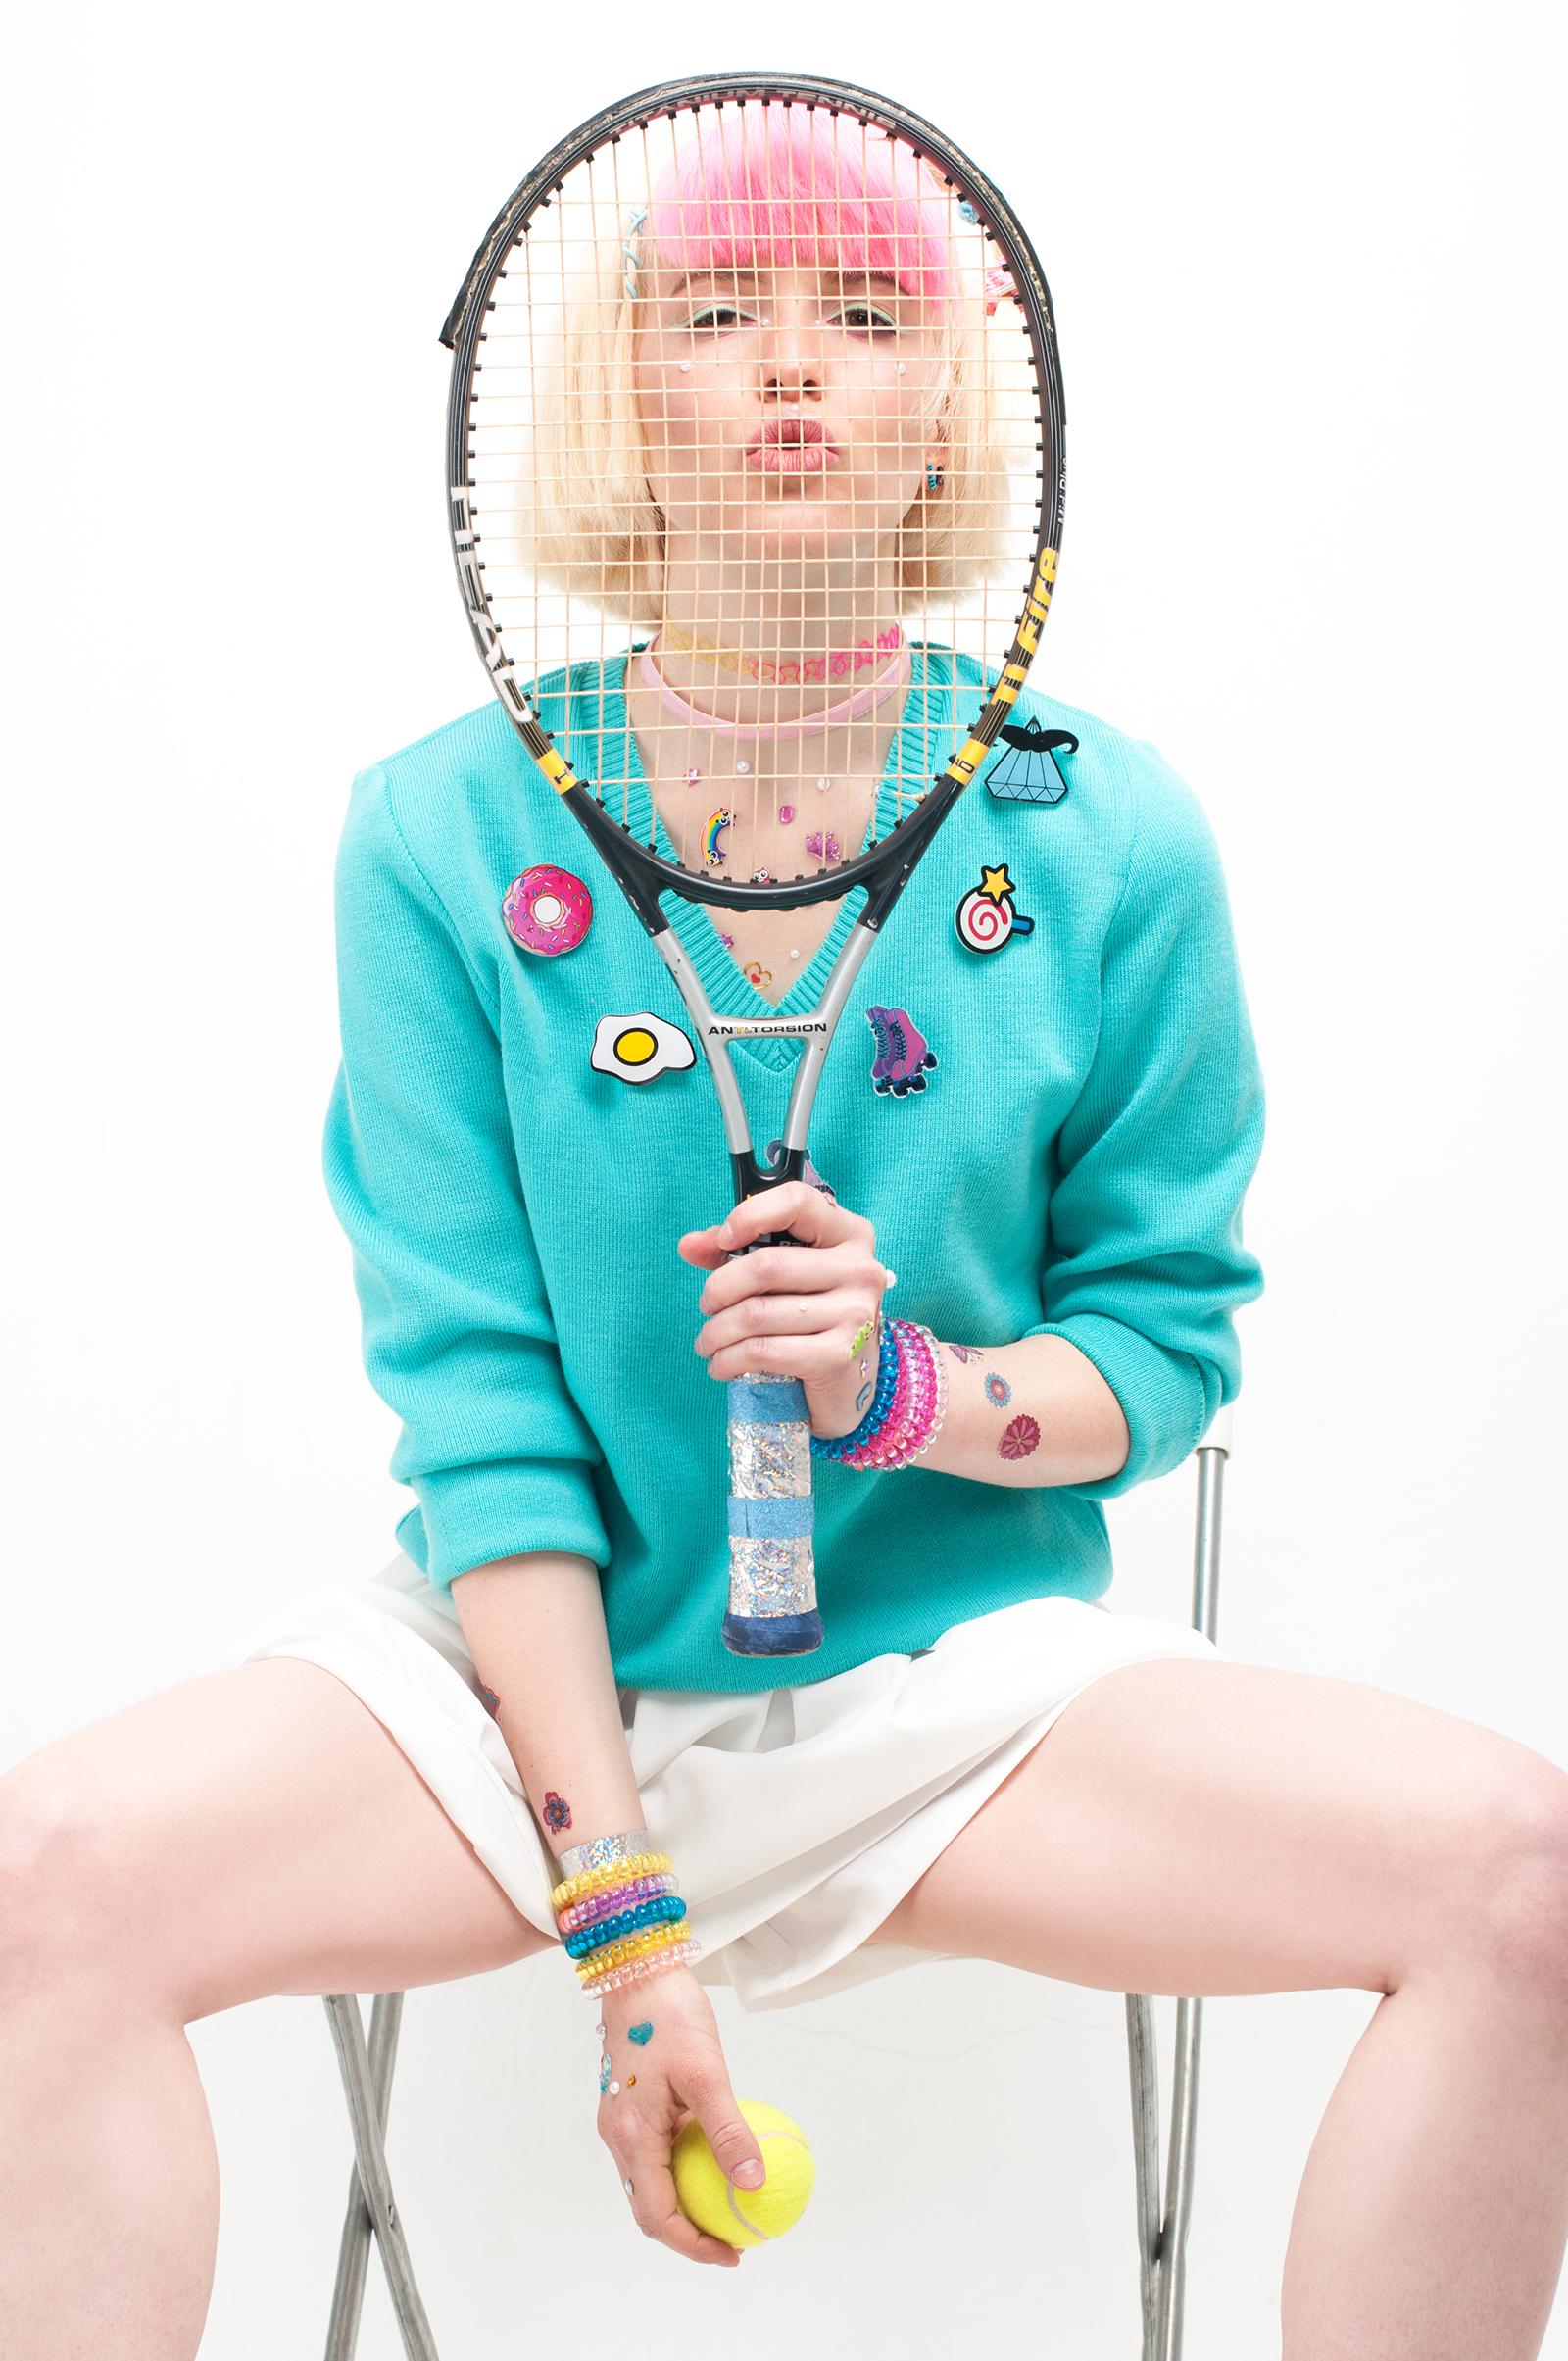 Sweater: #LenaGolova Shorts: H&M Chokers: Accessorize and #LenaGolova